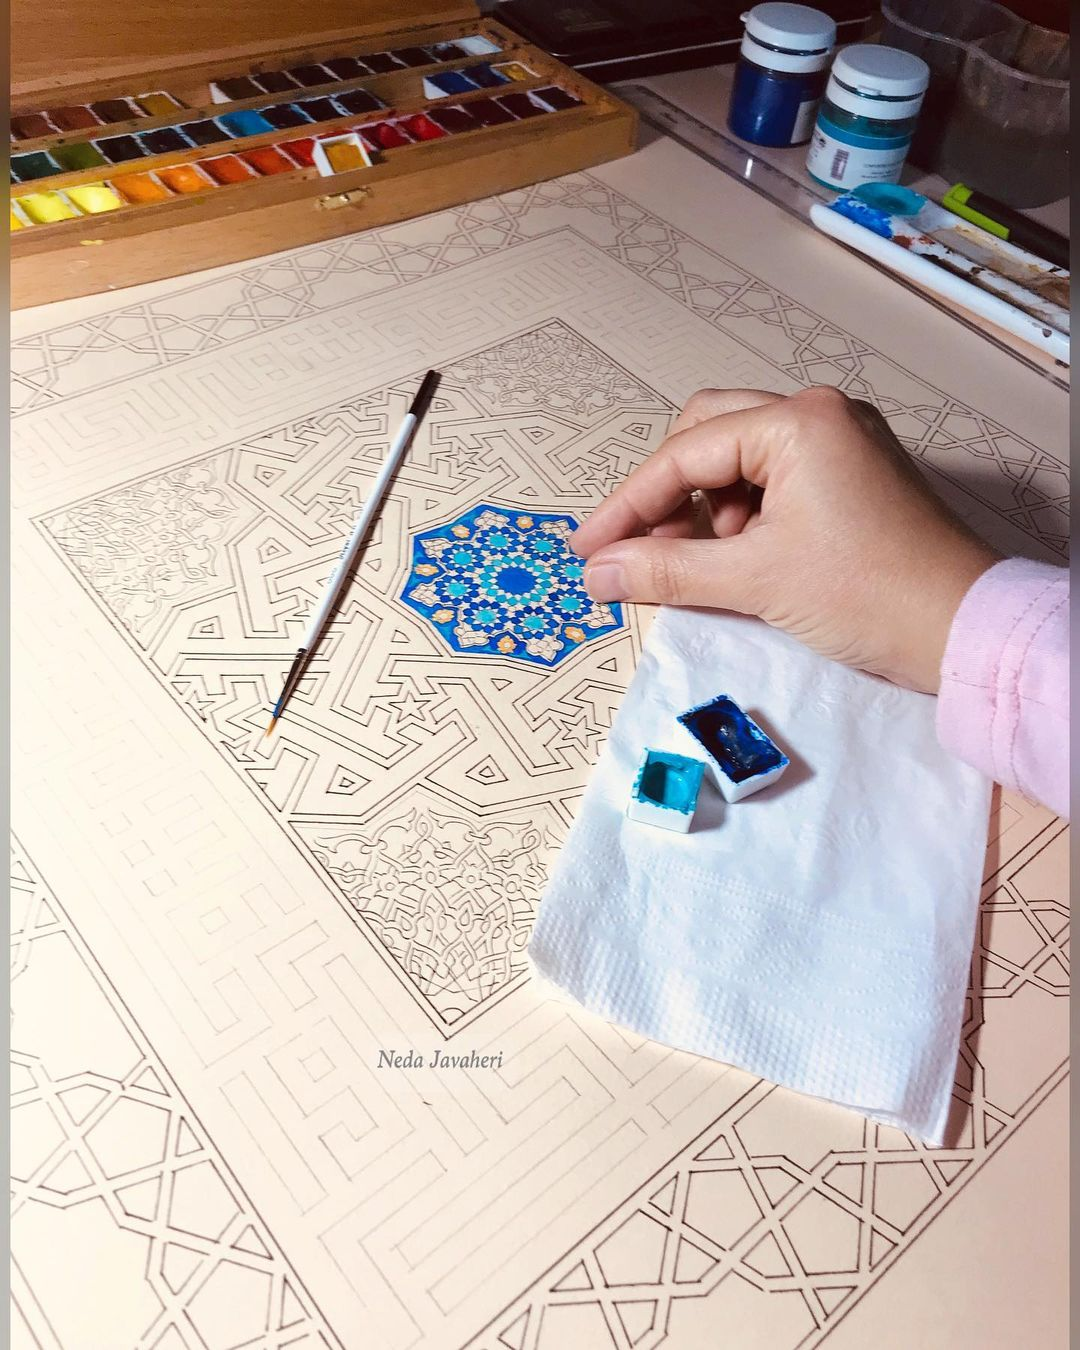 Karya Kaligrafi . و این کوچکترین دلبر  بچه ها یه توضیحی در مورد طراحیها بدهم.  ببینین سالها پیش...- Ne Javaher 1